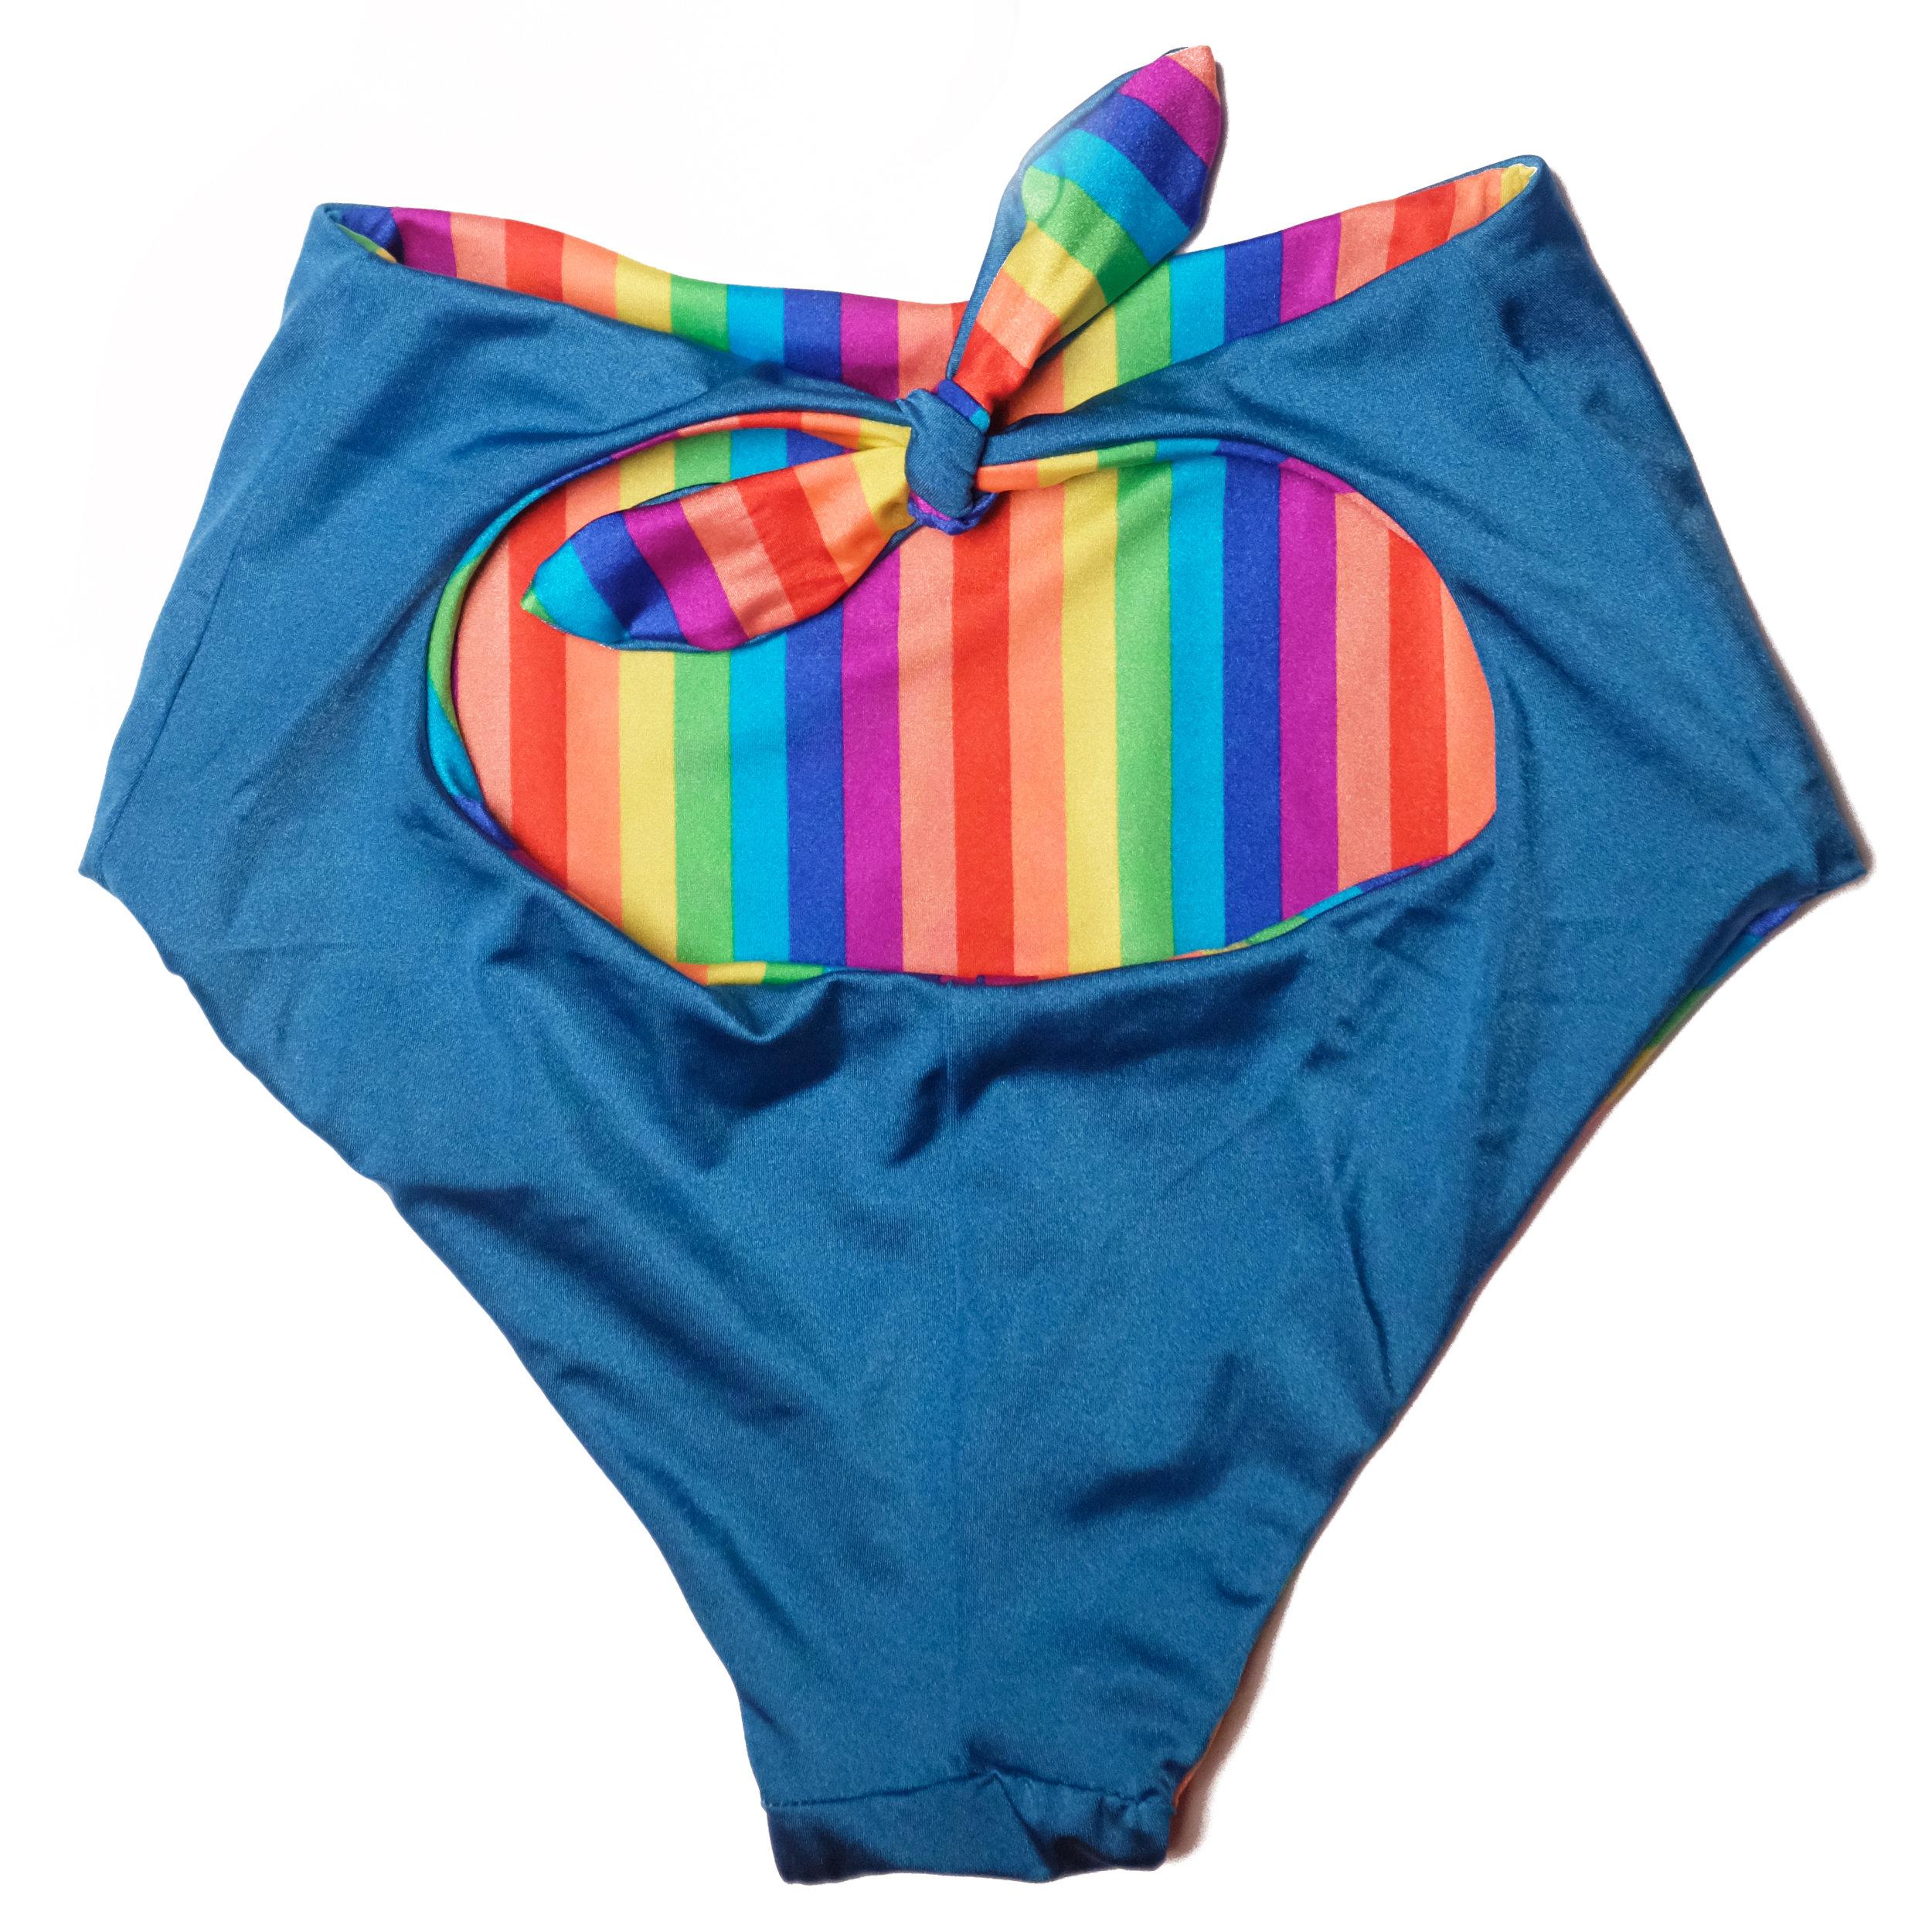 bikini bottom high 2 blue back.jpg